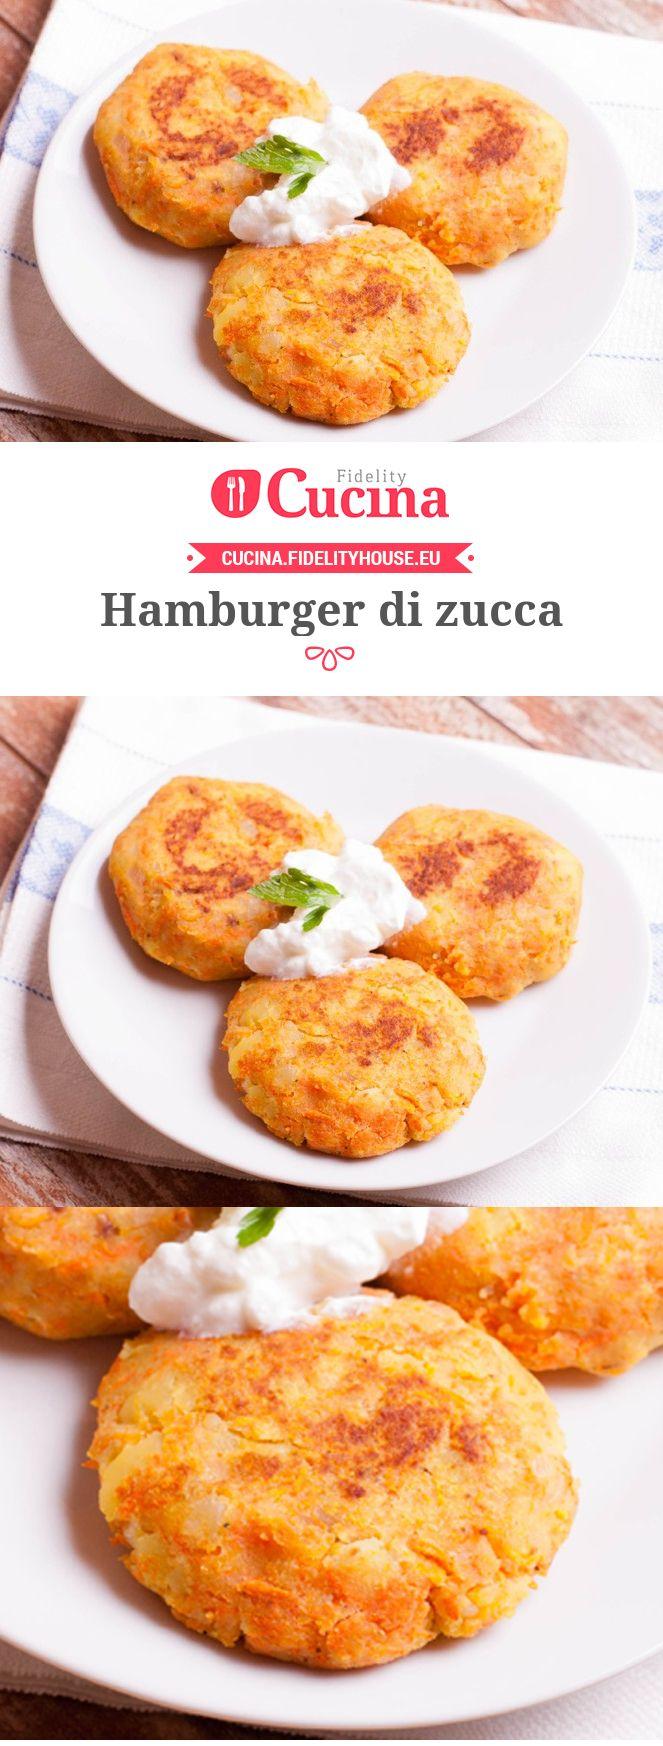 #Hamburger di #zucca